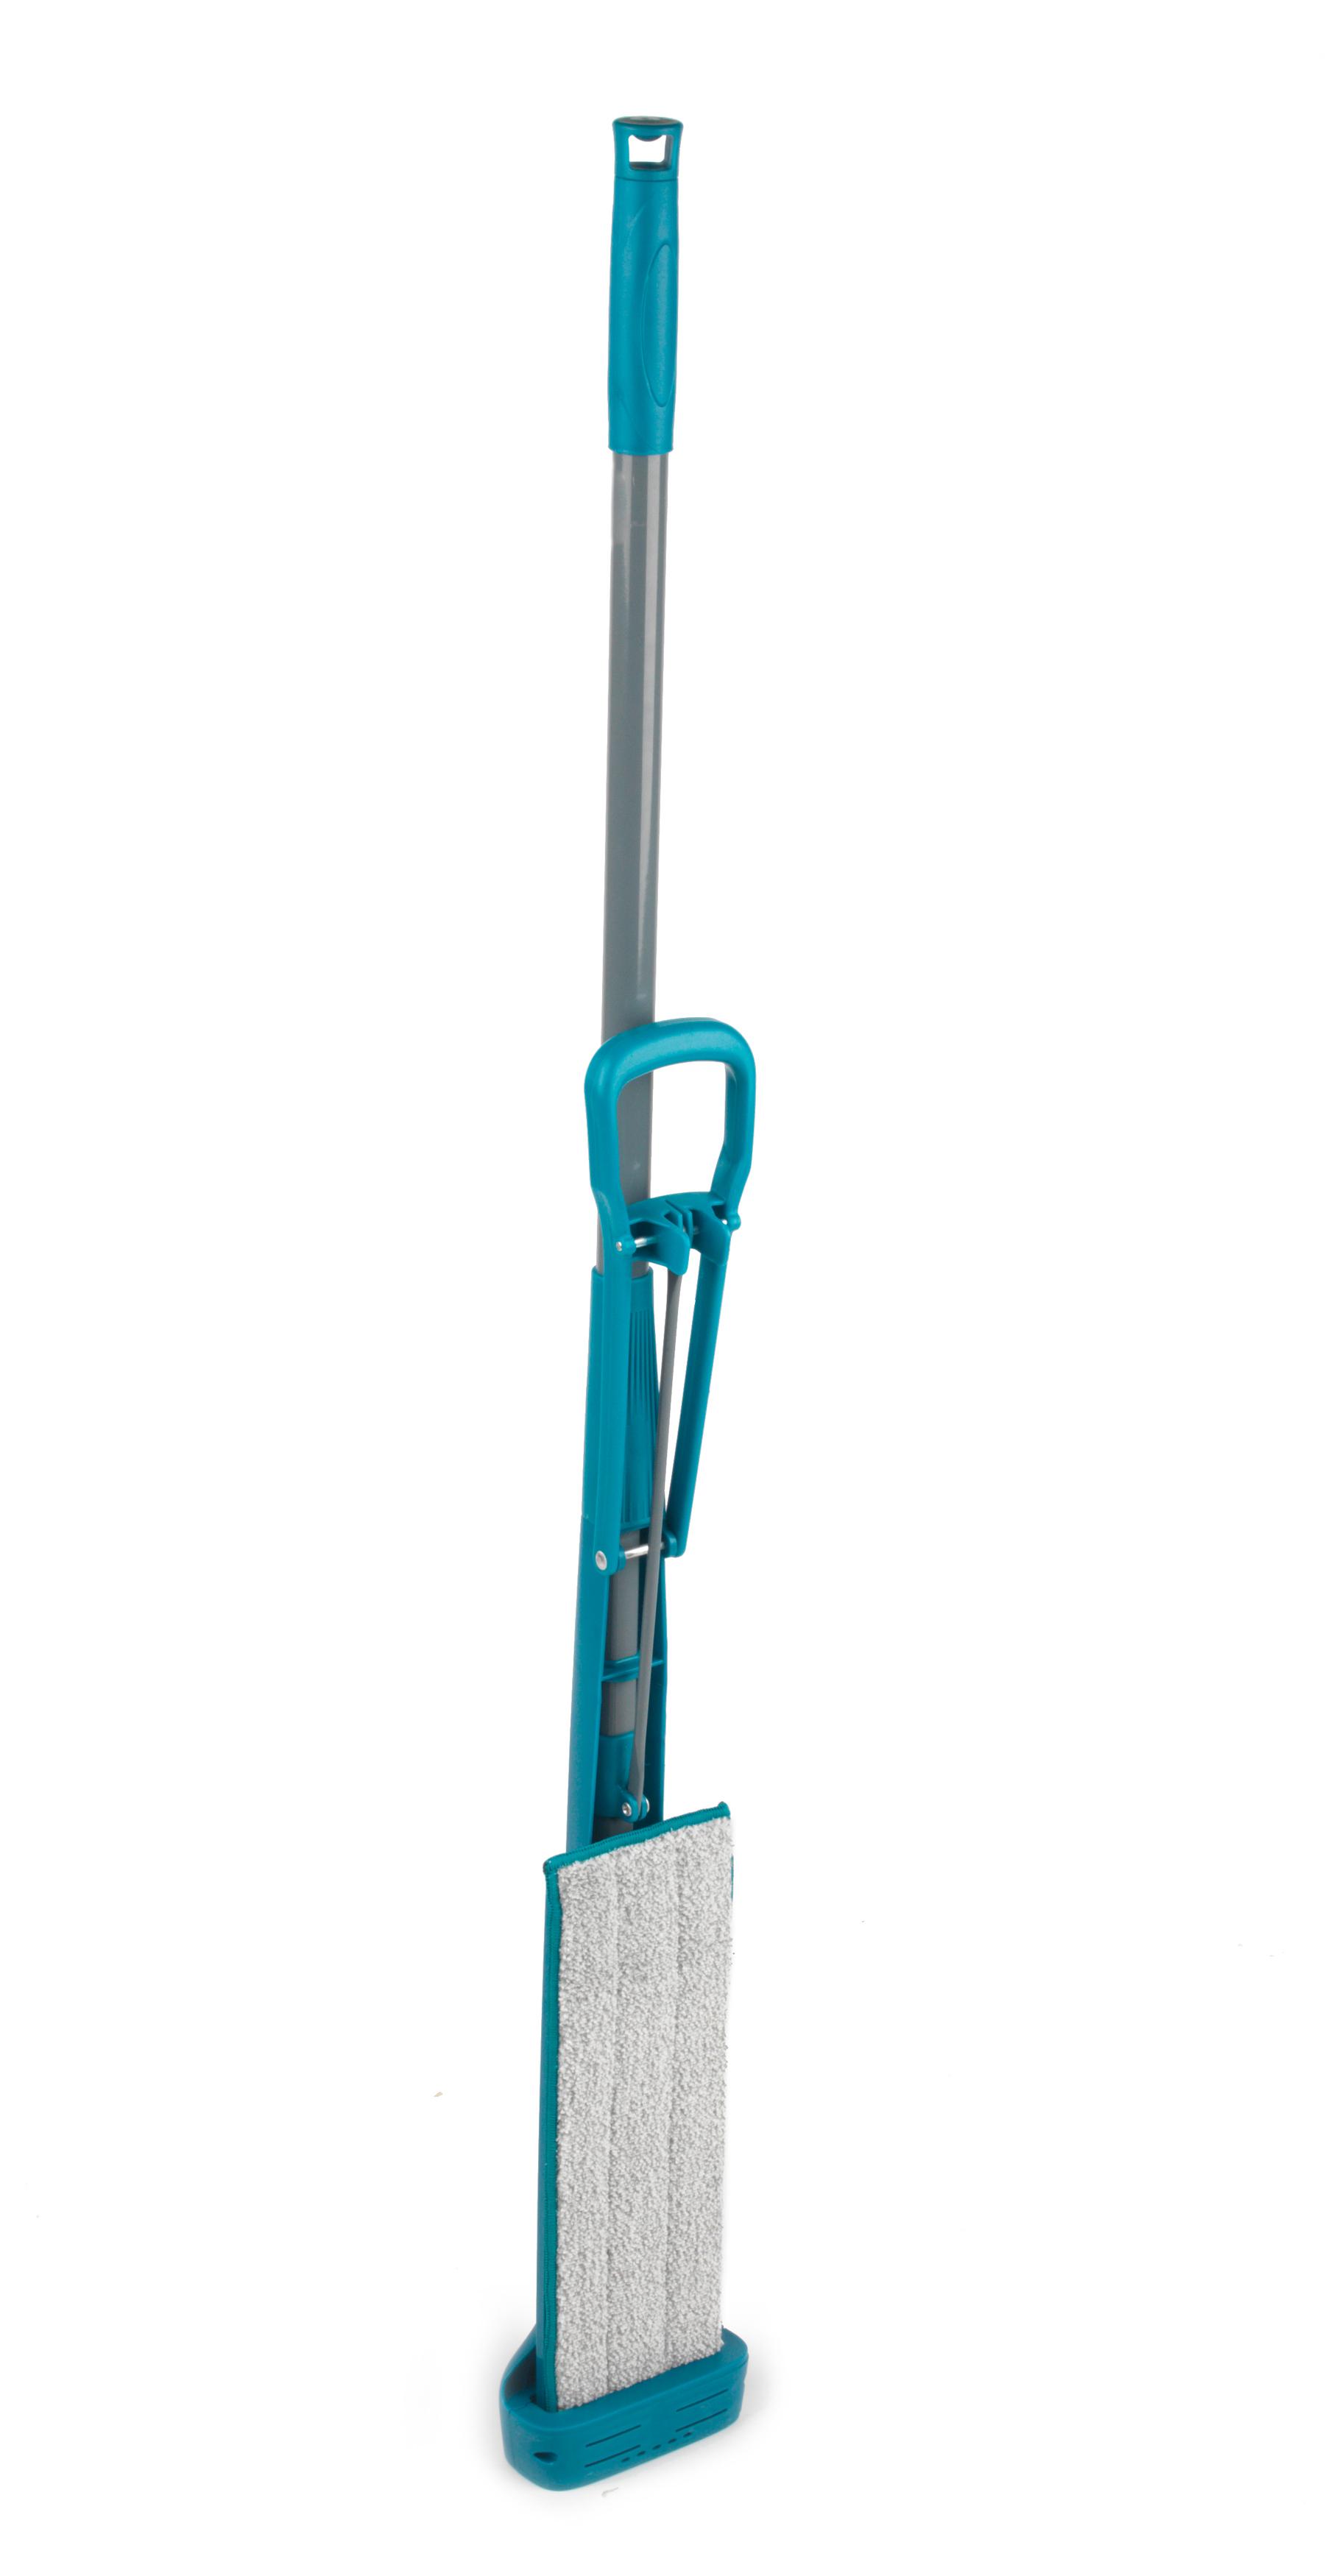 Beldray La035196 Turquoise Self Wringing Squeegee Mop